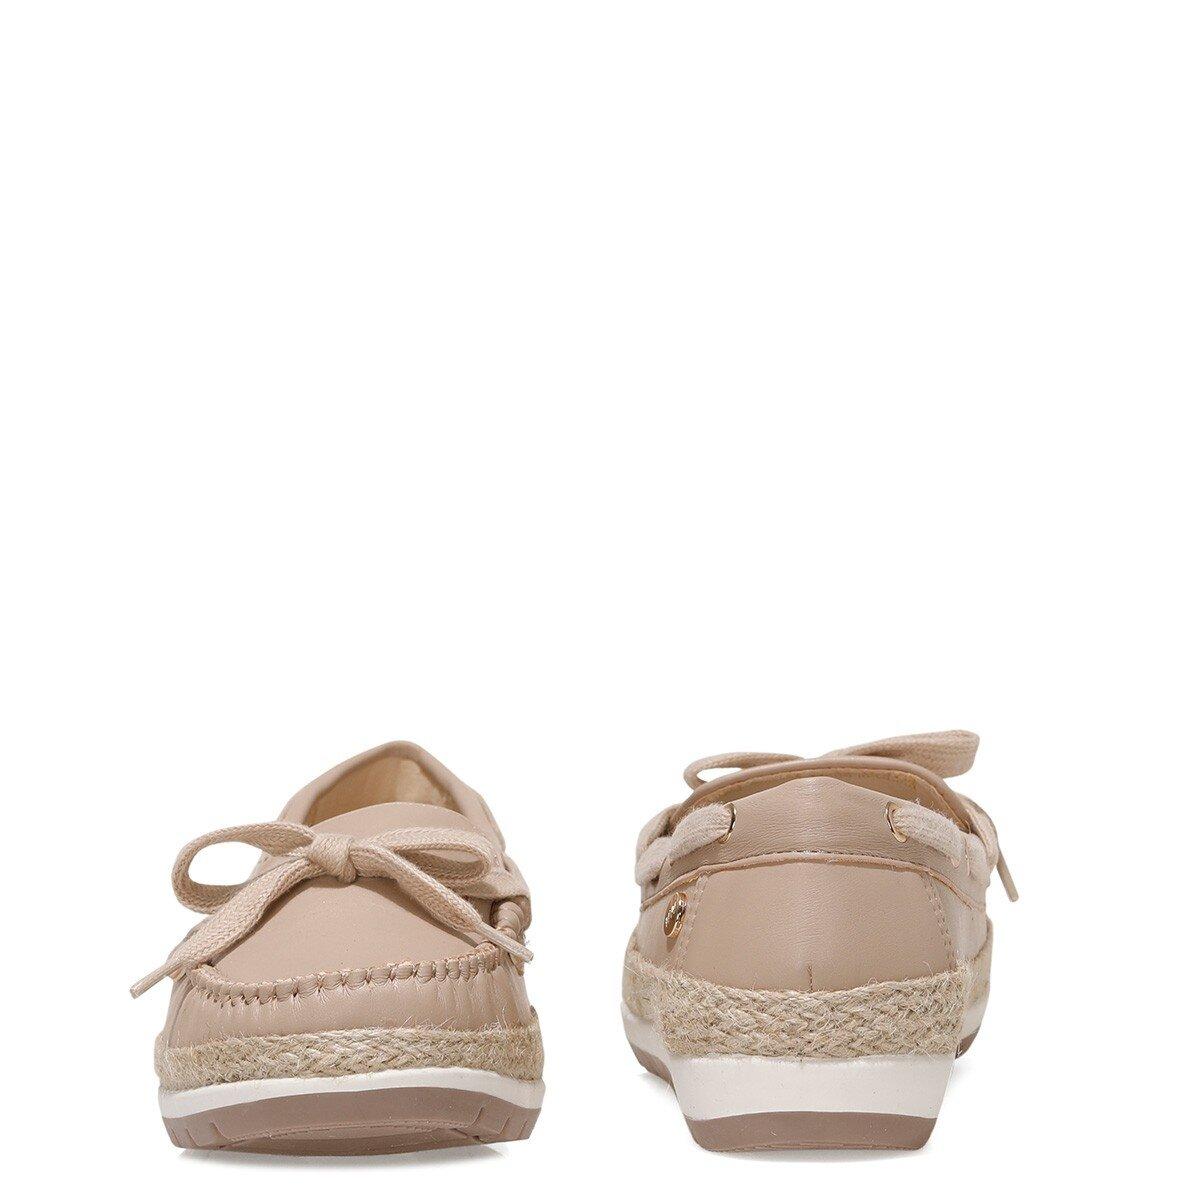 ALITHIEN 1FX Kum Rengi Kadın Loafer Ayakkabı